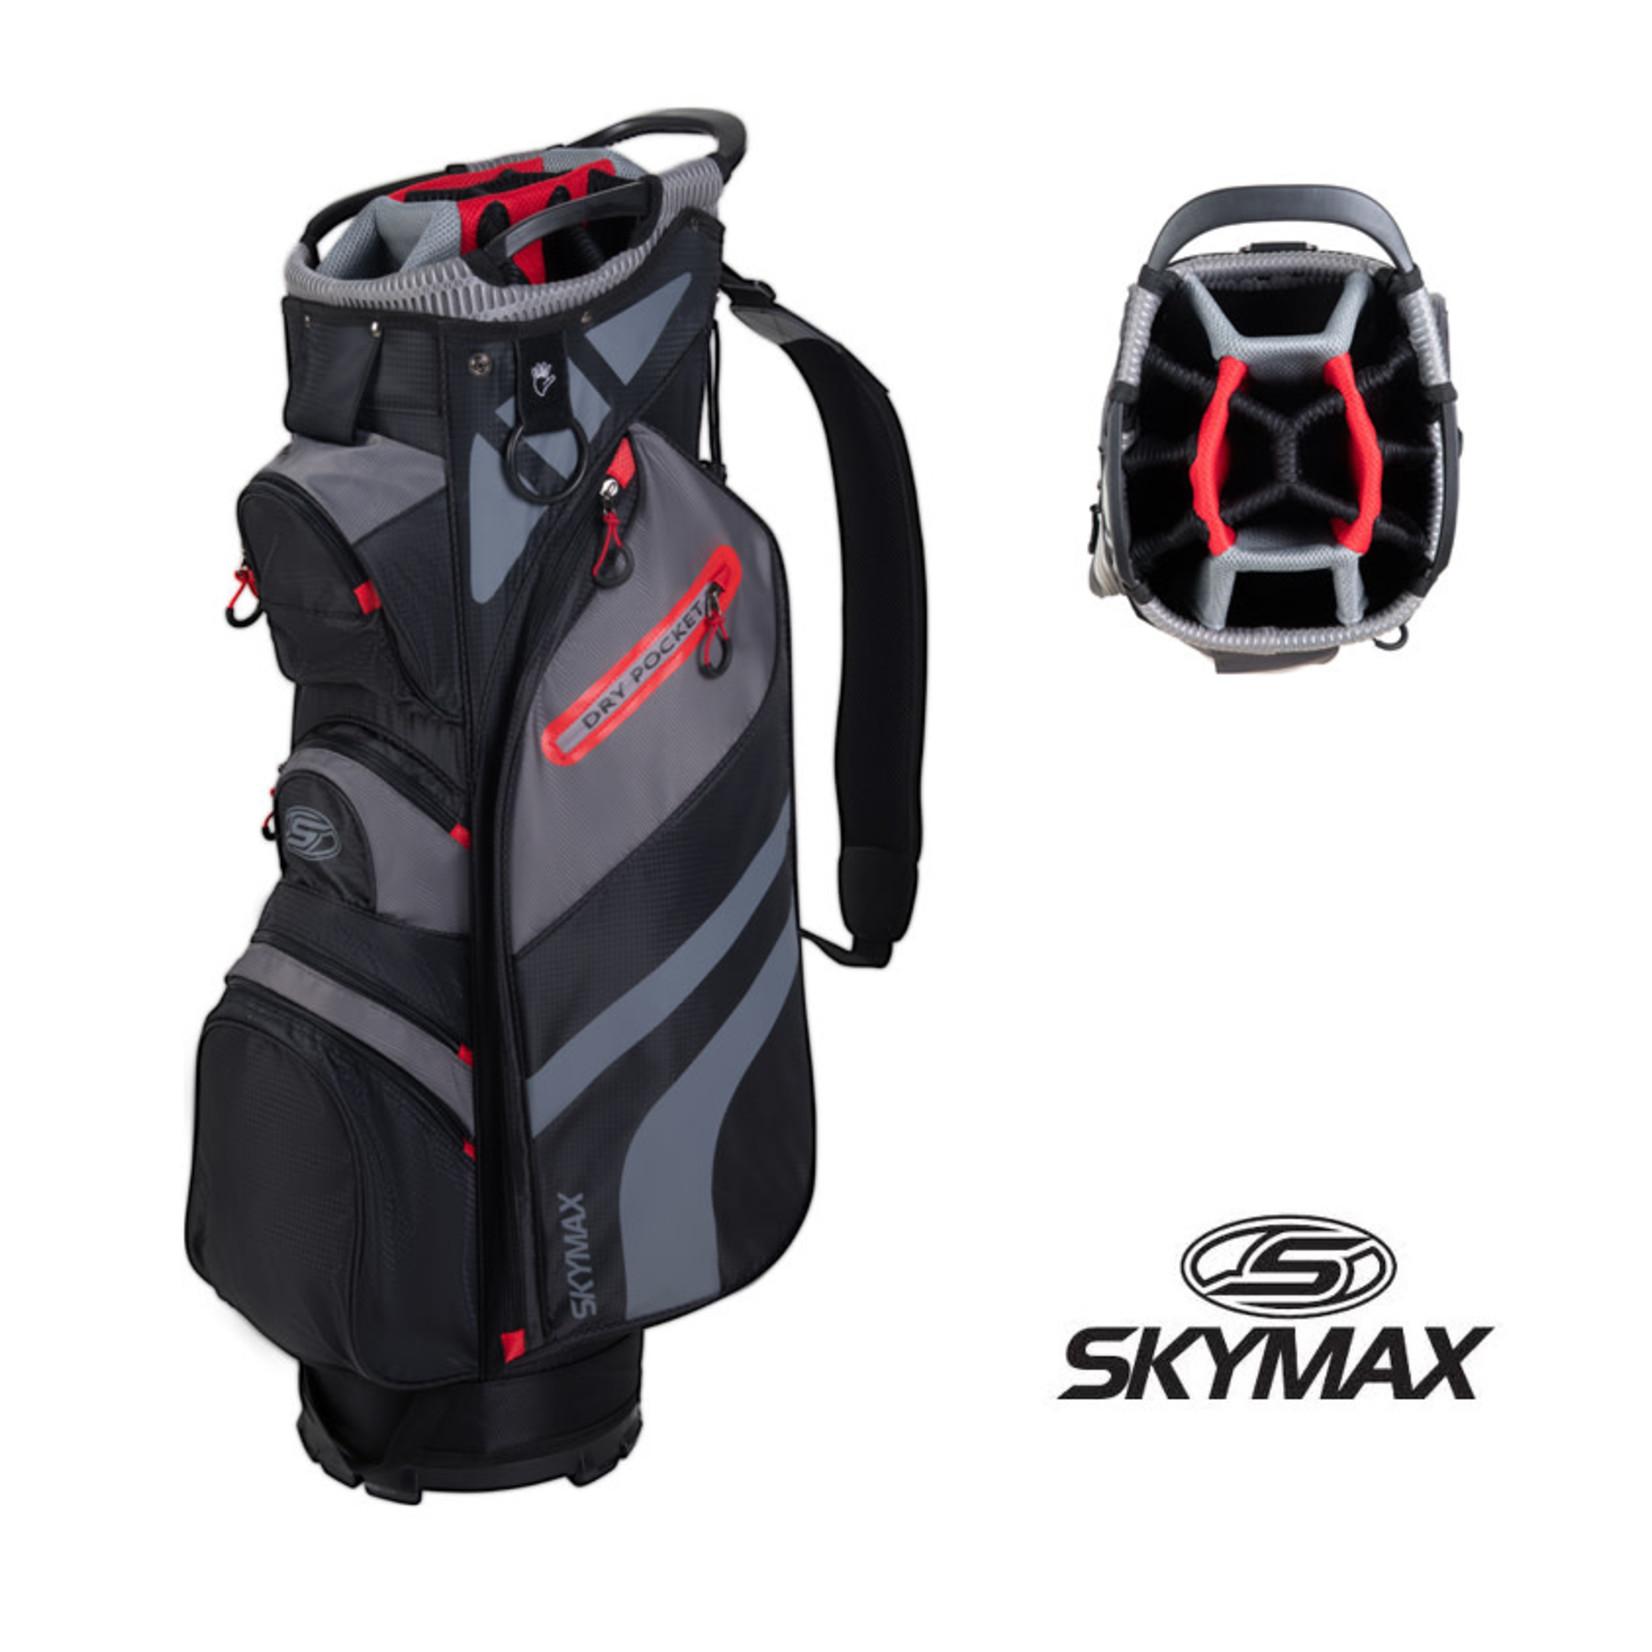 Skymax Skymax S1 dames complete set - met golftas